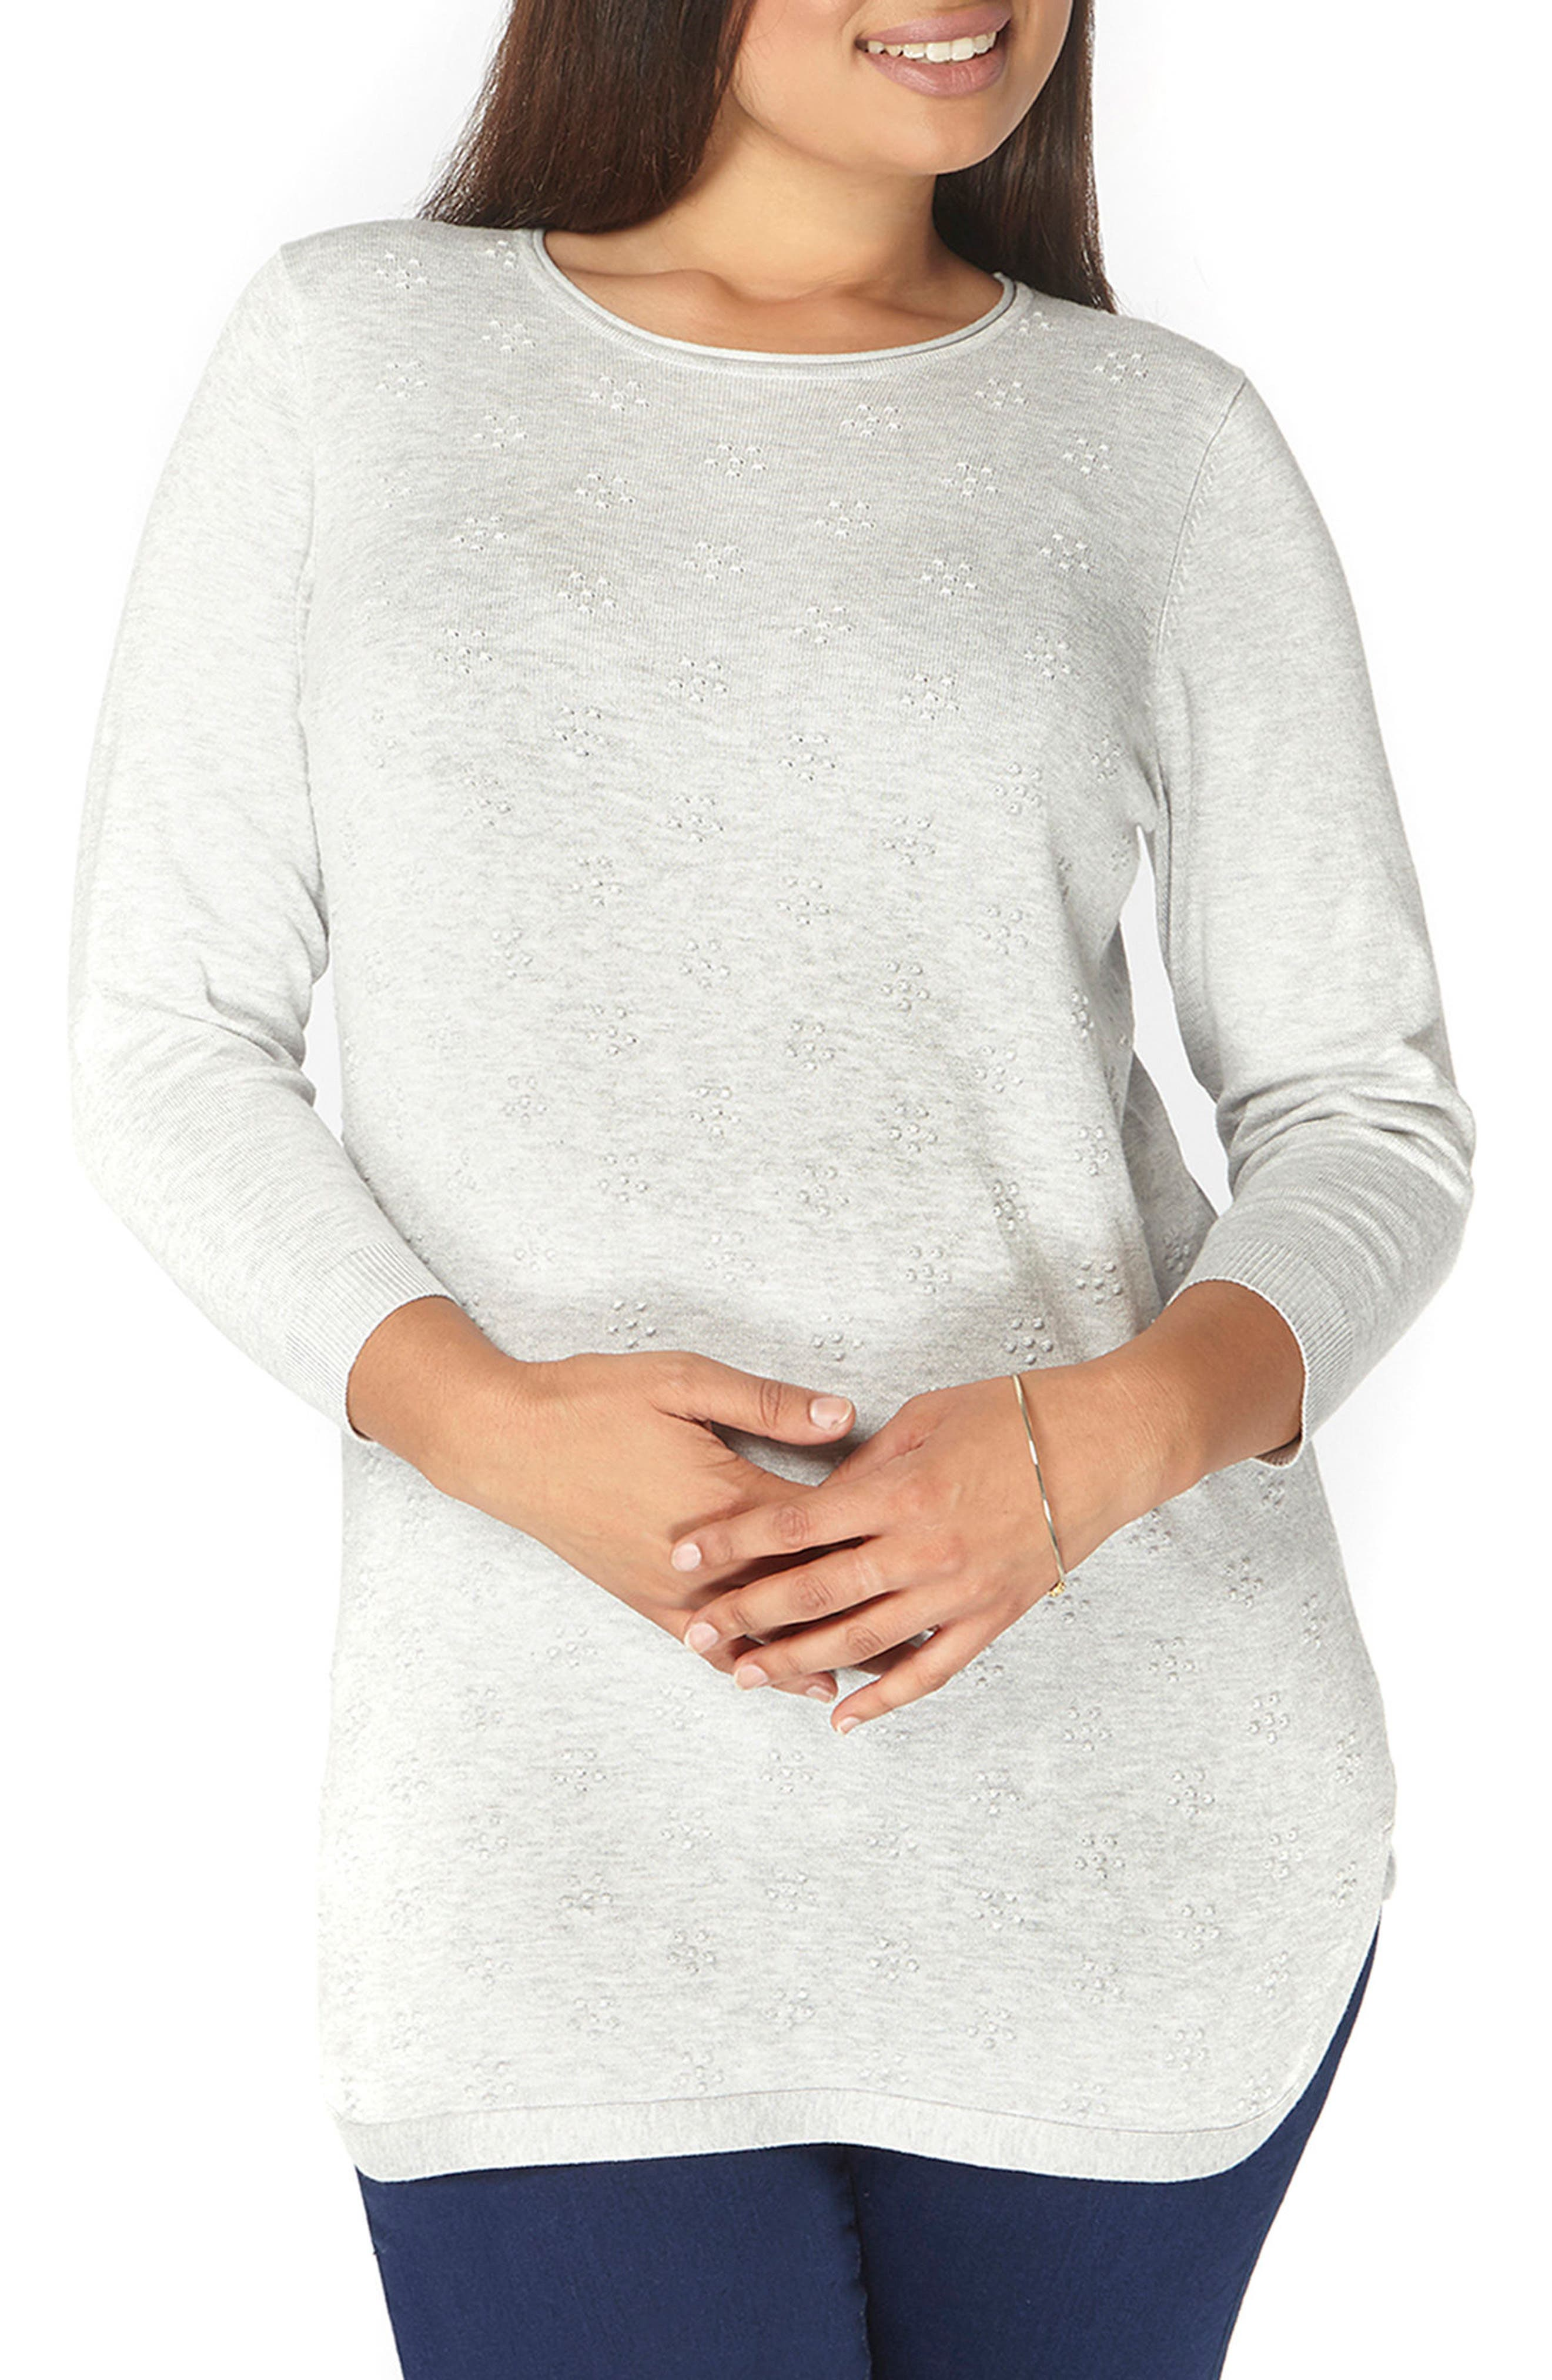 Dot Texture Sweater,                             Main thumbnail 1, color,                             020